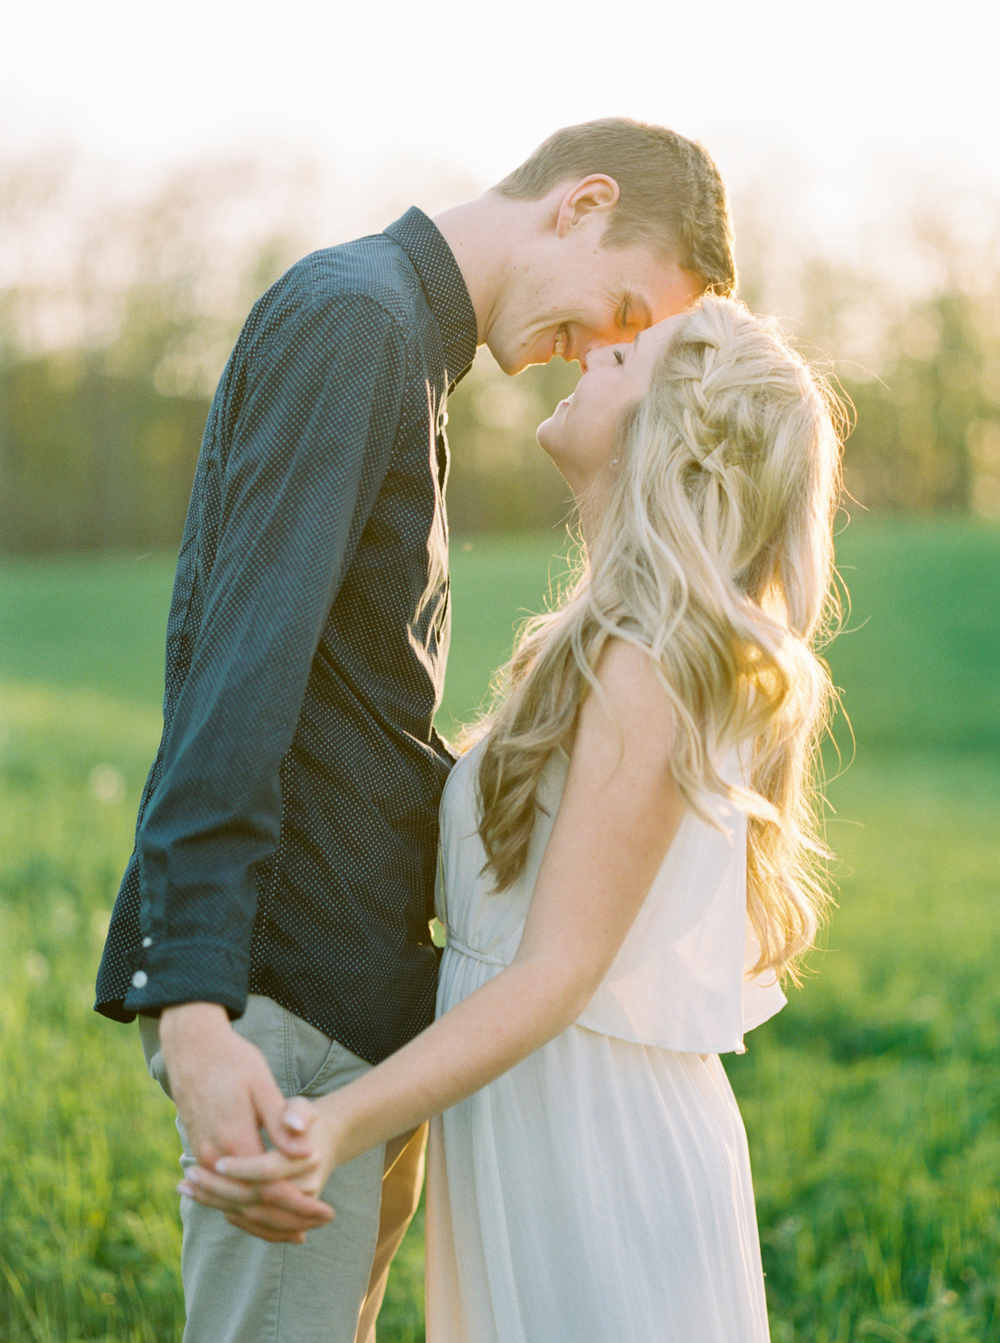 Katie-Nicolle-Niagara-Toronto-Muskoka-Wedding-26.jpg